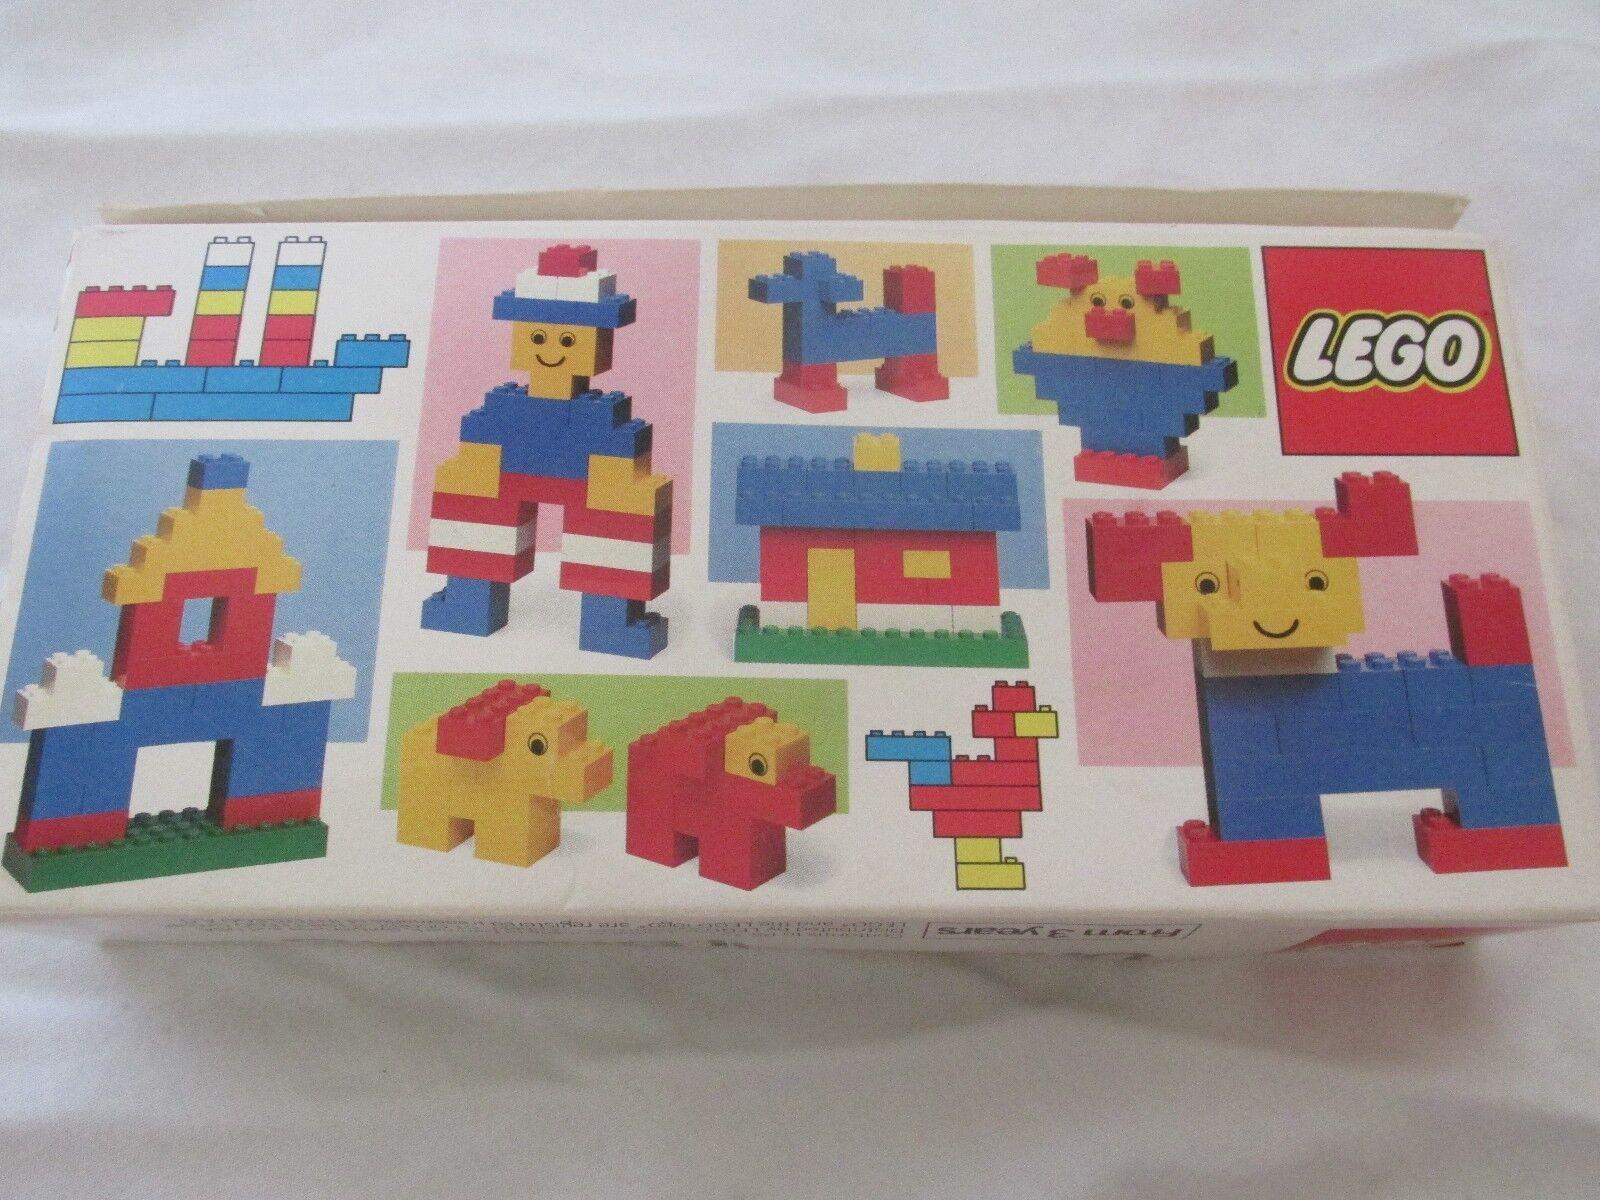 Brand New in Box Vintage 1983 Lego Universal Building Building Building Set Model No. 1911 34 Pcs. 1f4629